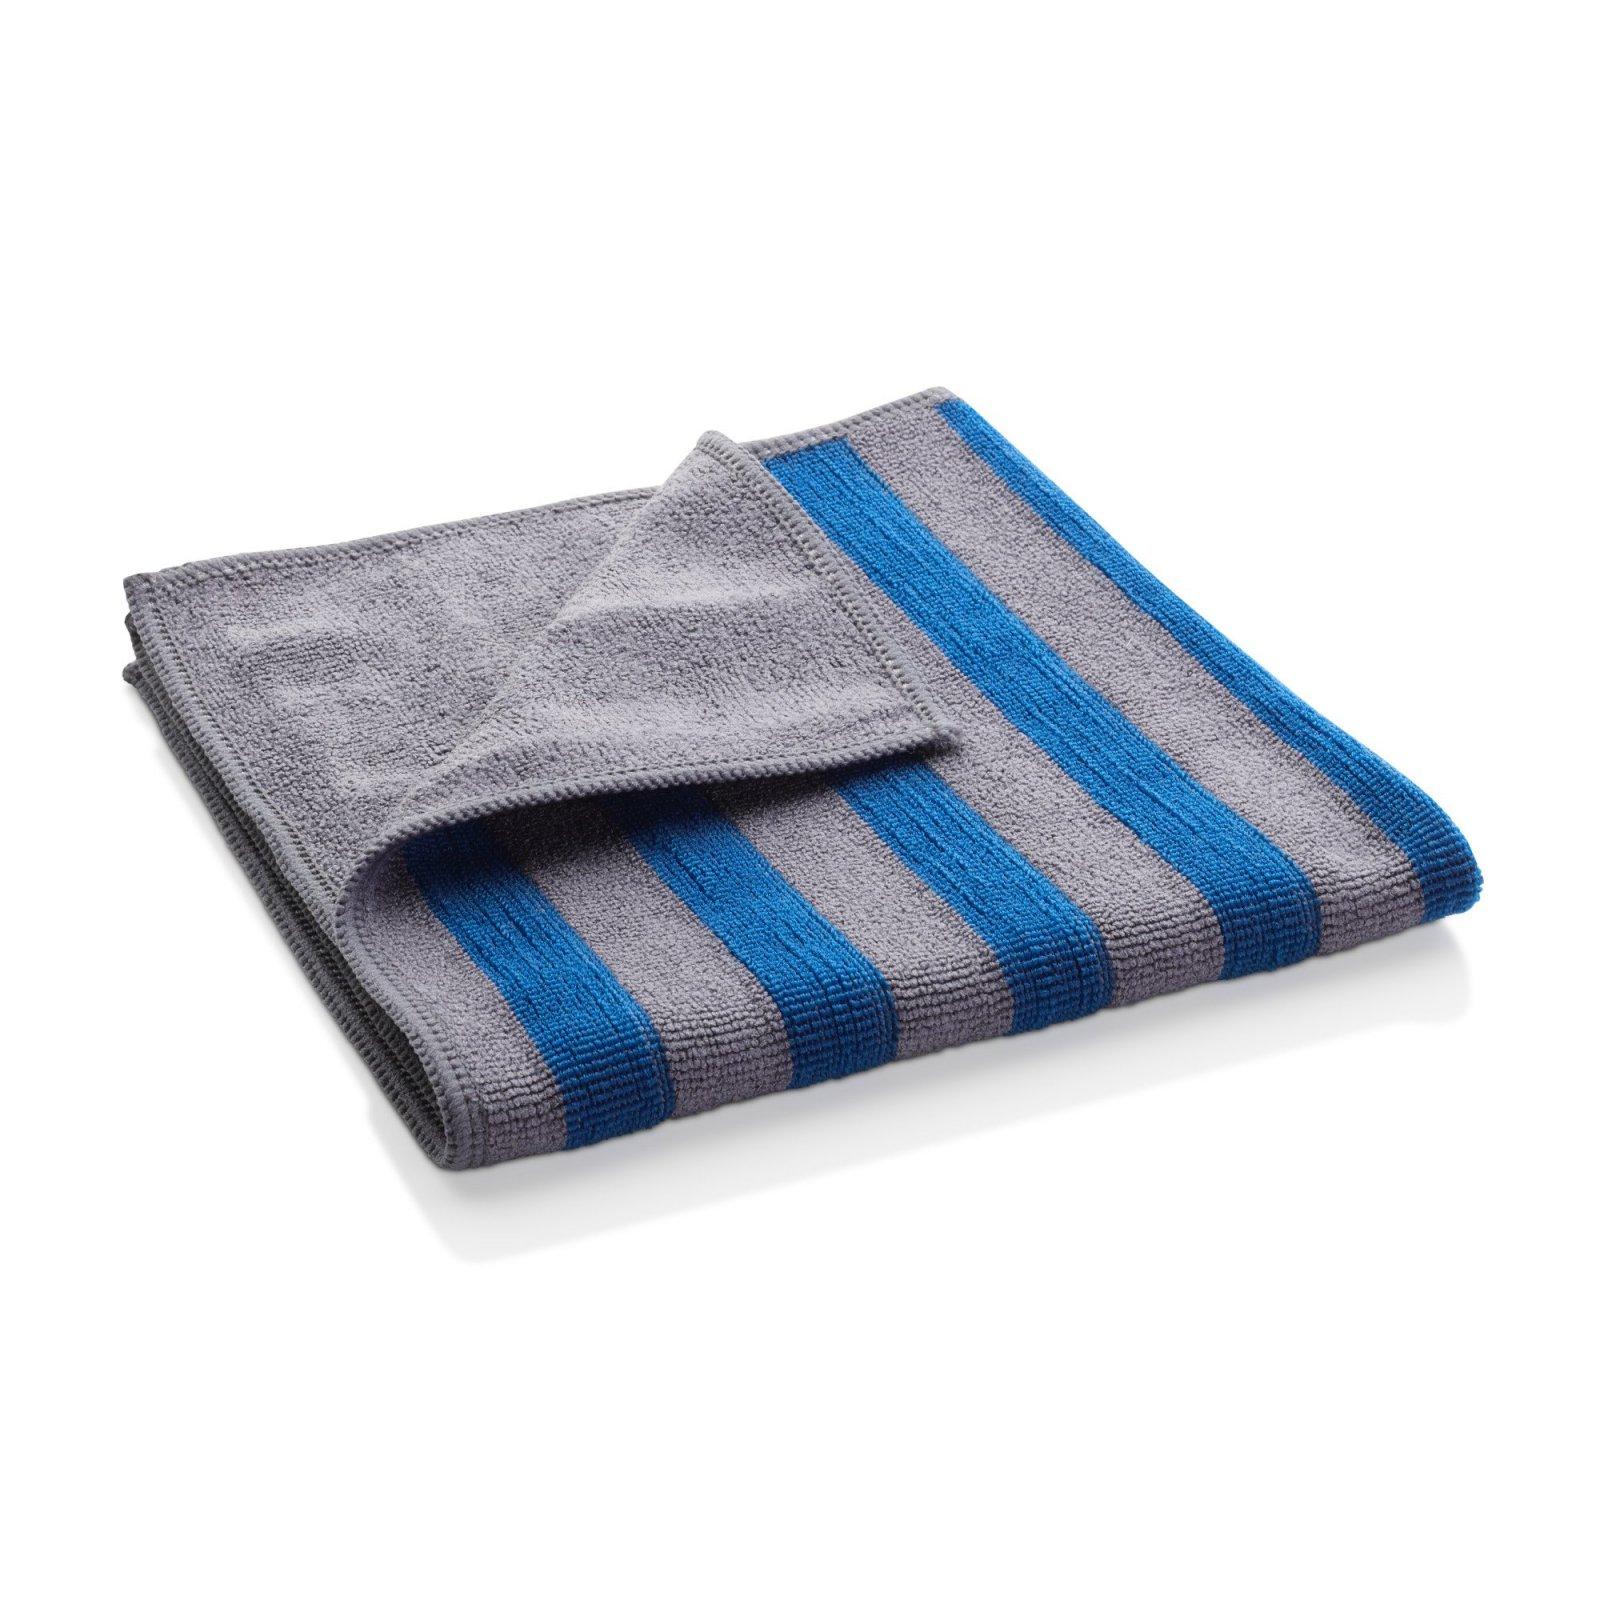 Range & Stovetop Cloth